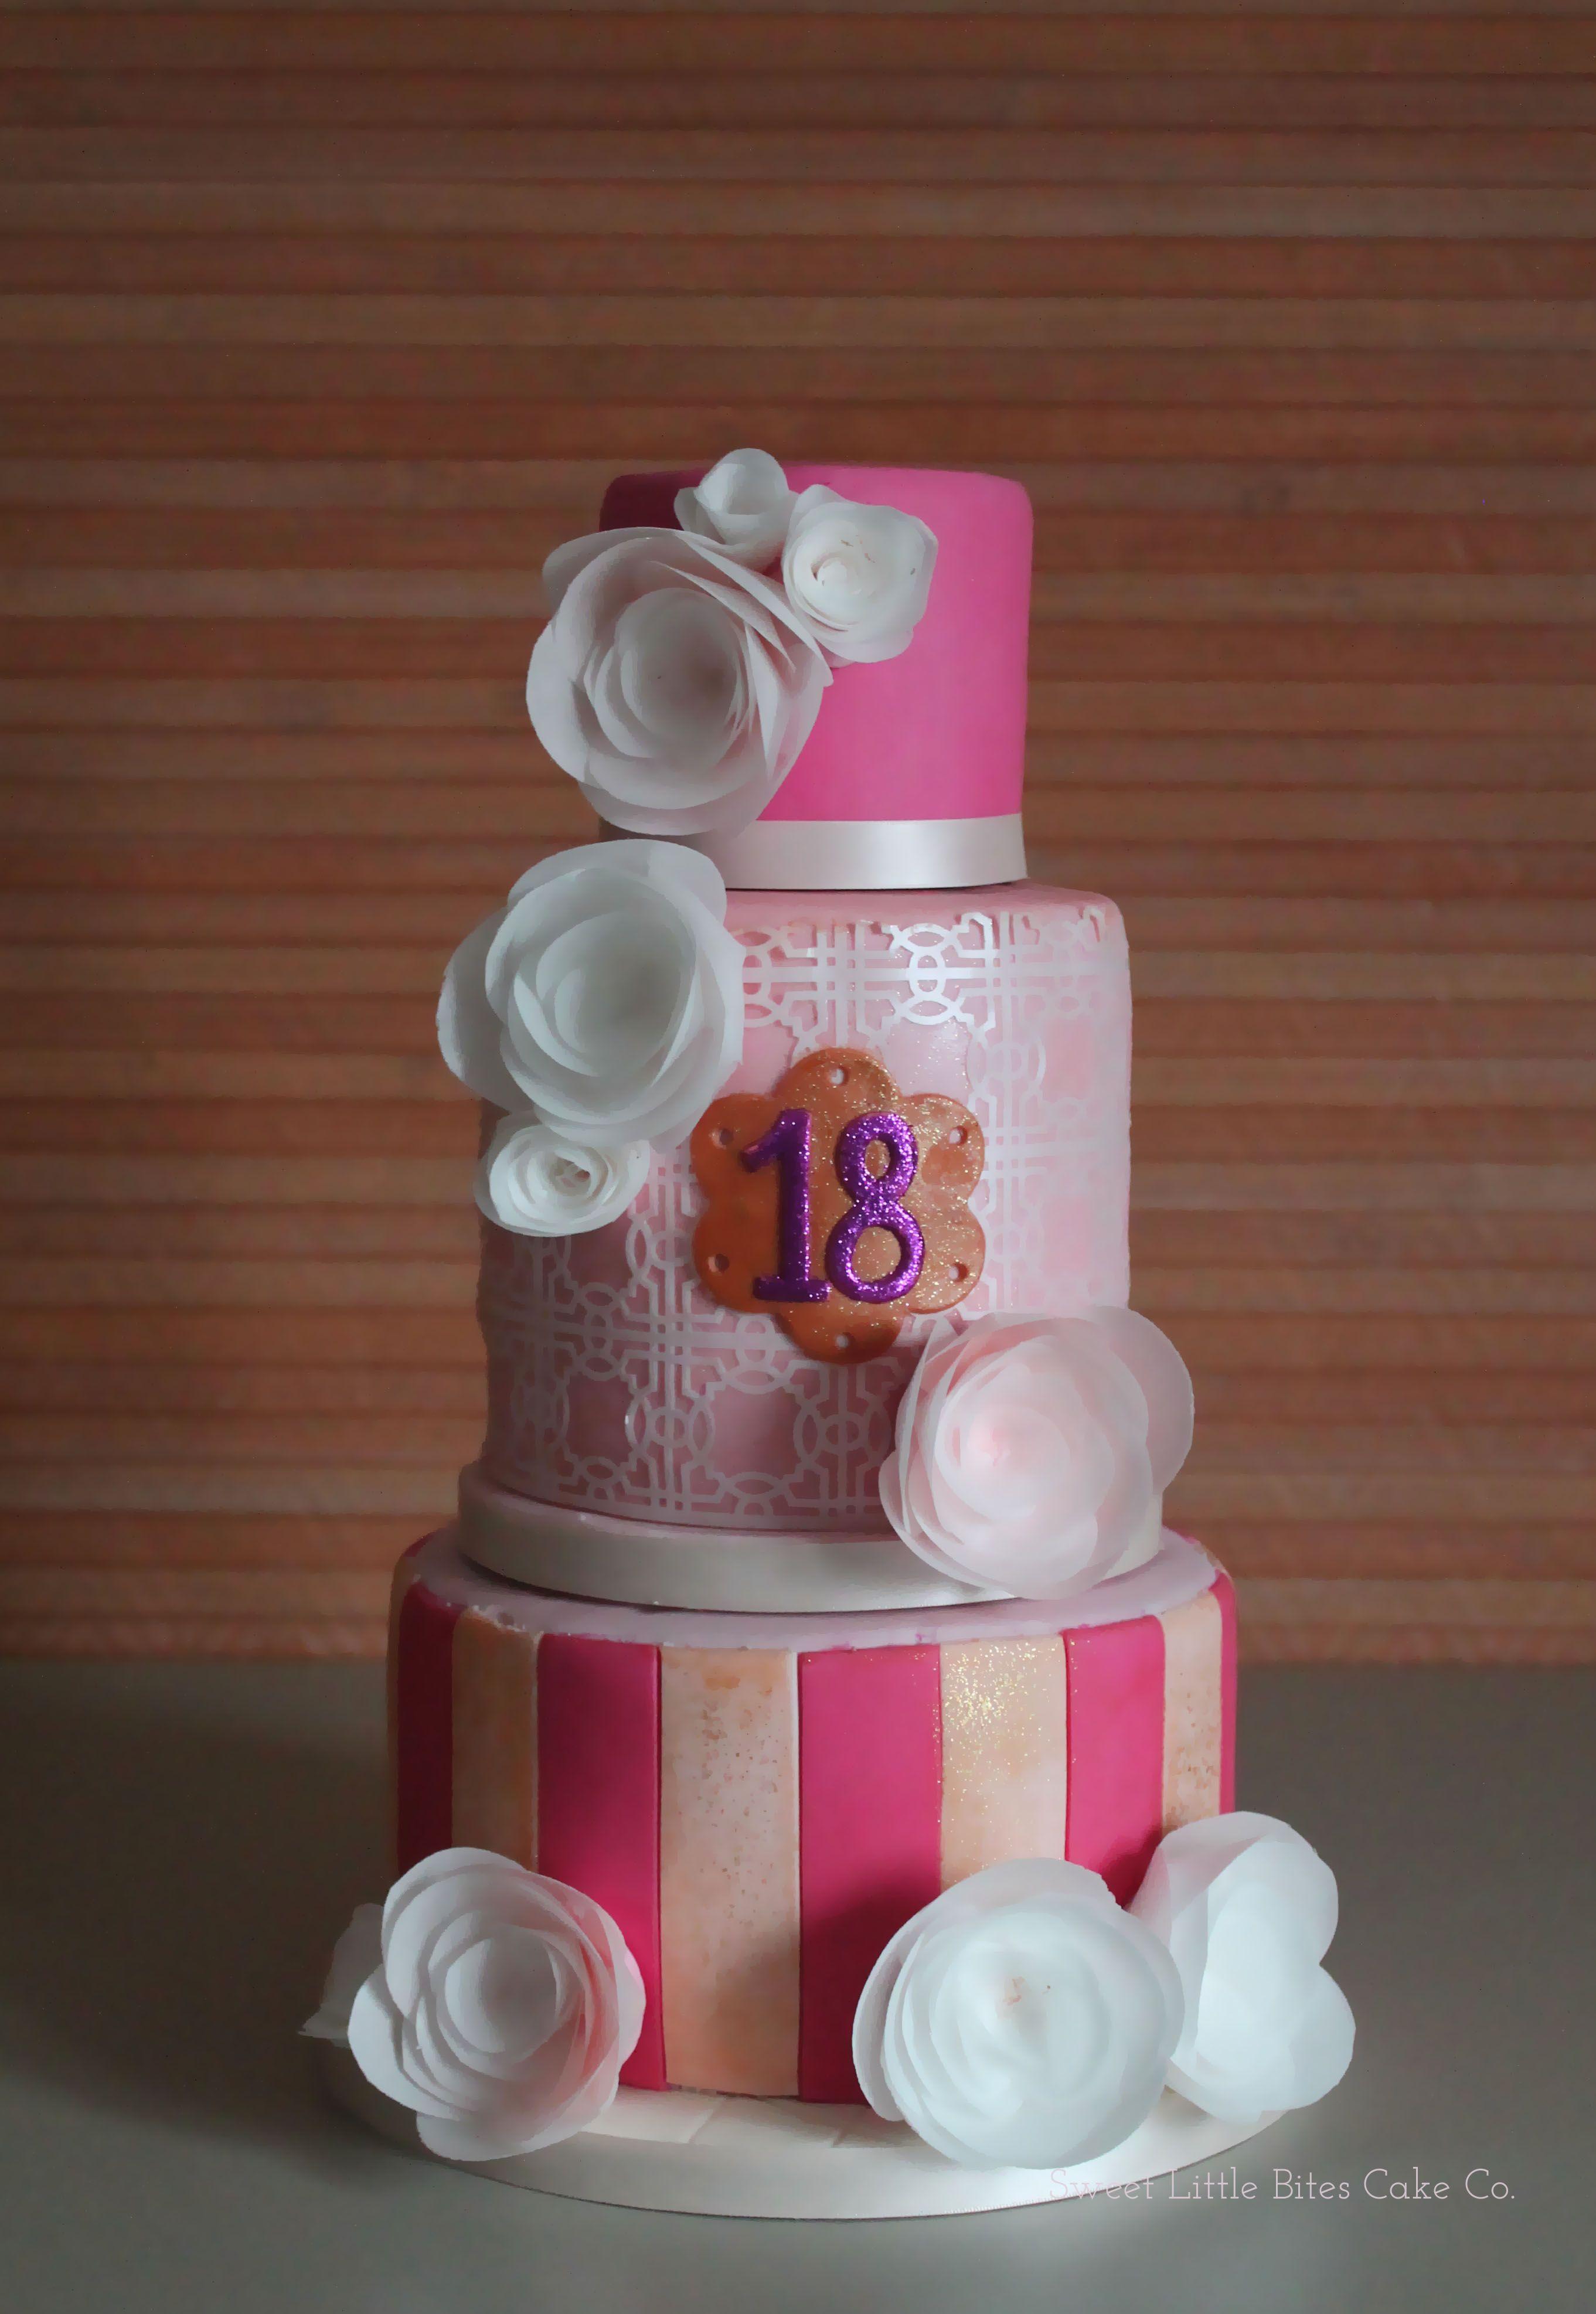 18th Birthday Party Cake Birthdaycake Sweetlittlebites Little Bites